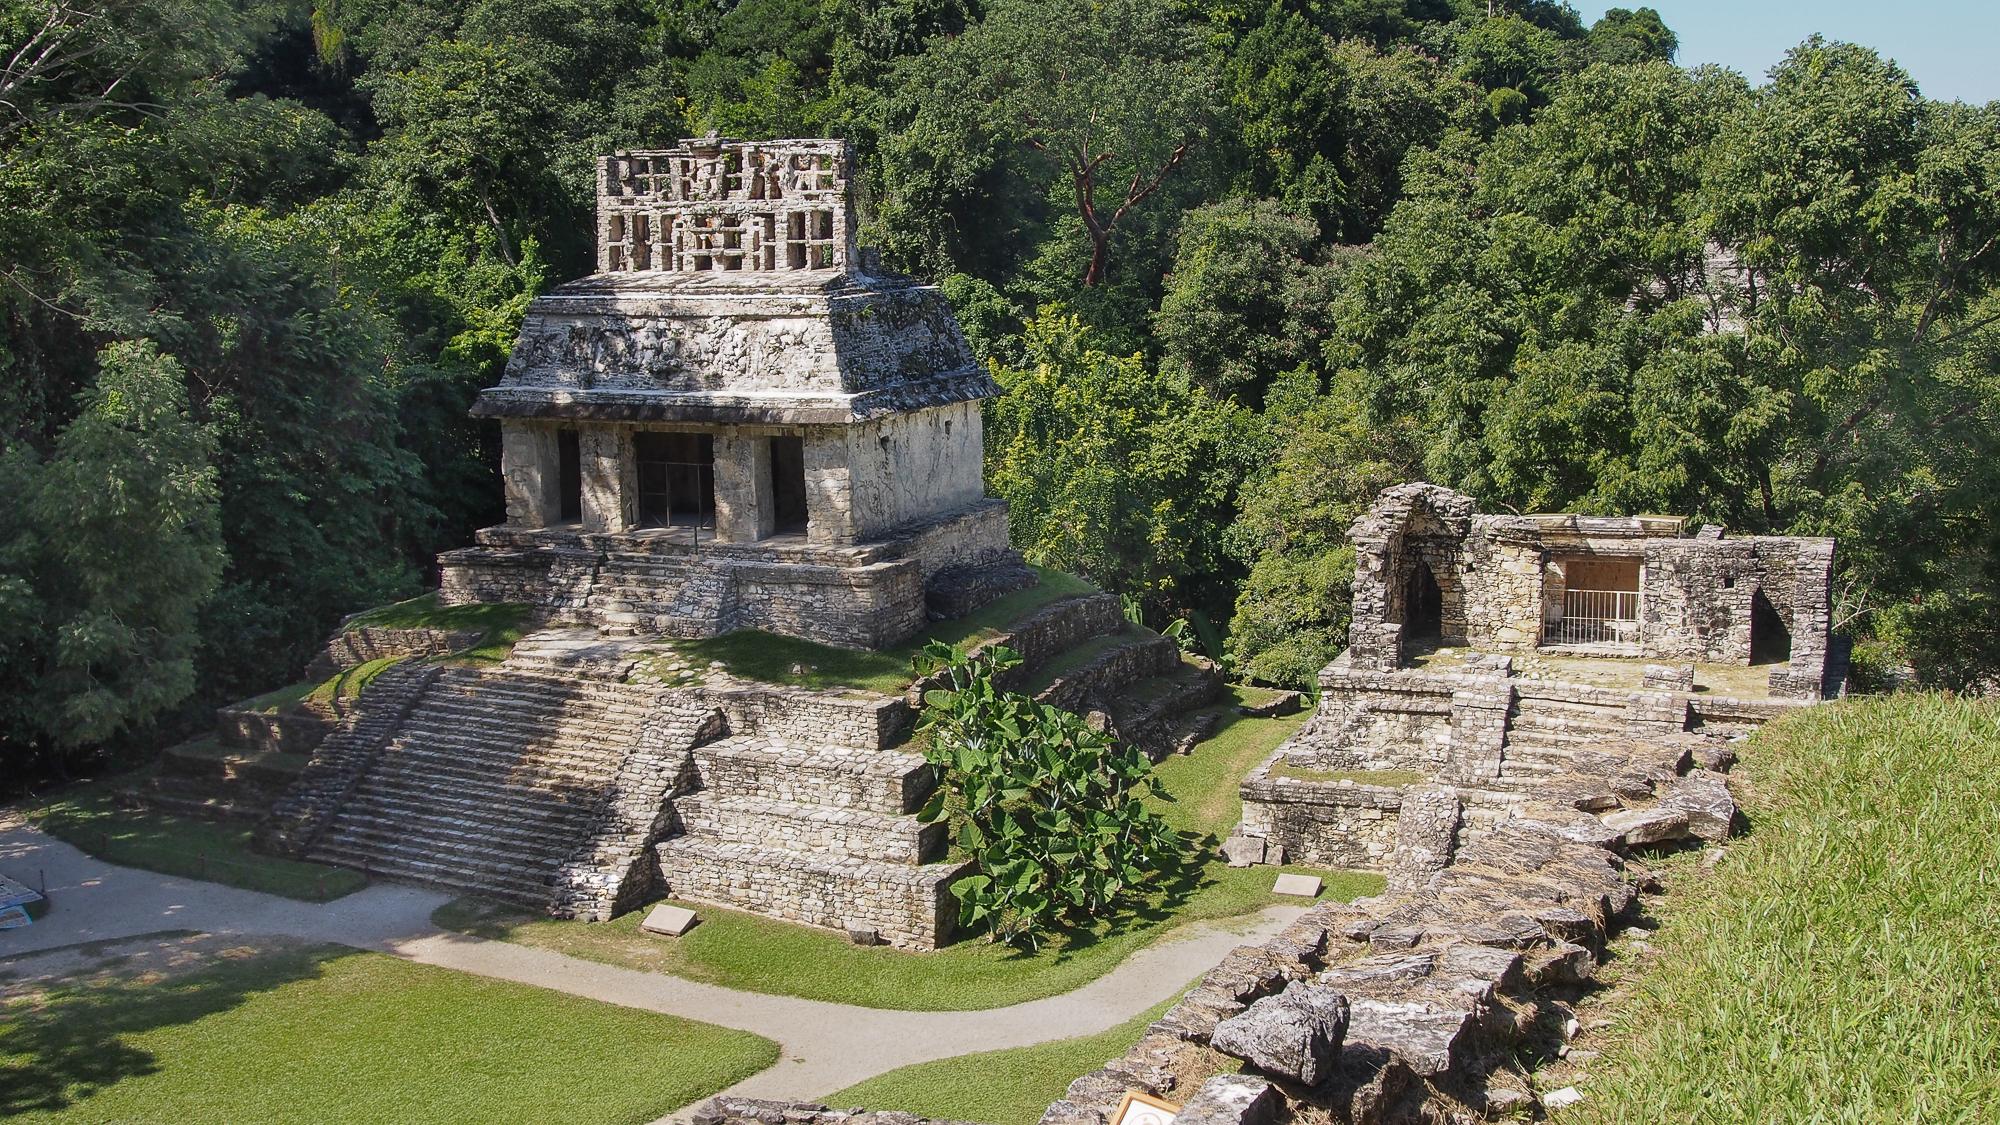 Templo del sol, Mexico